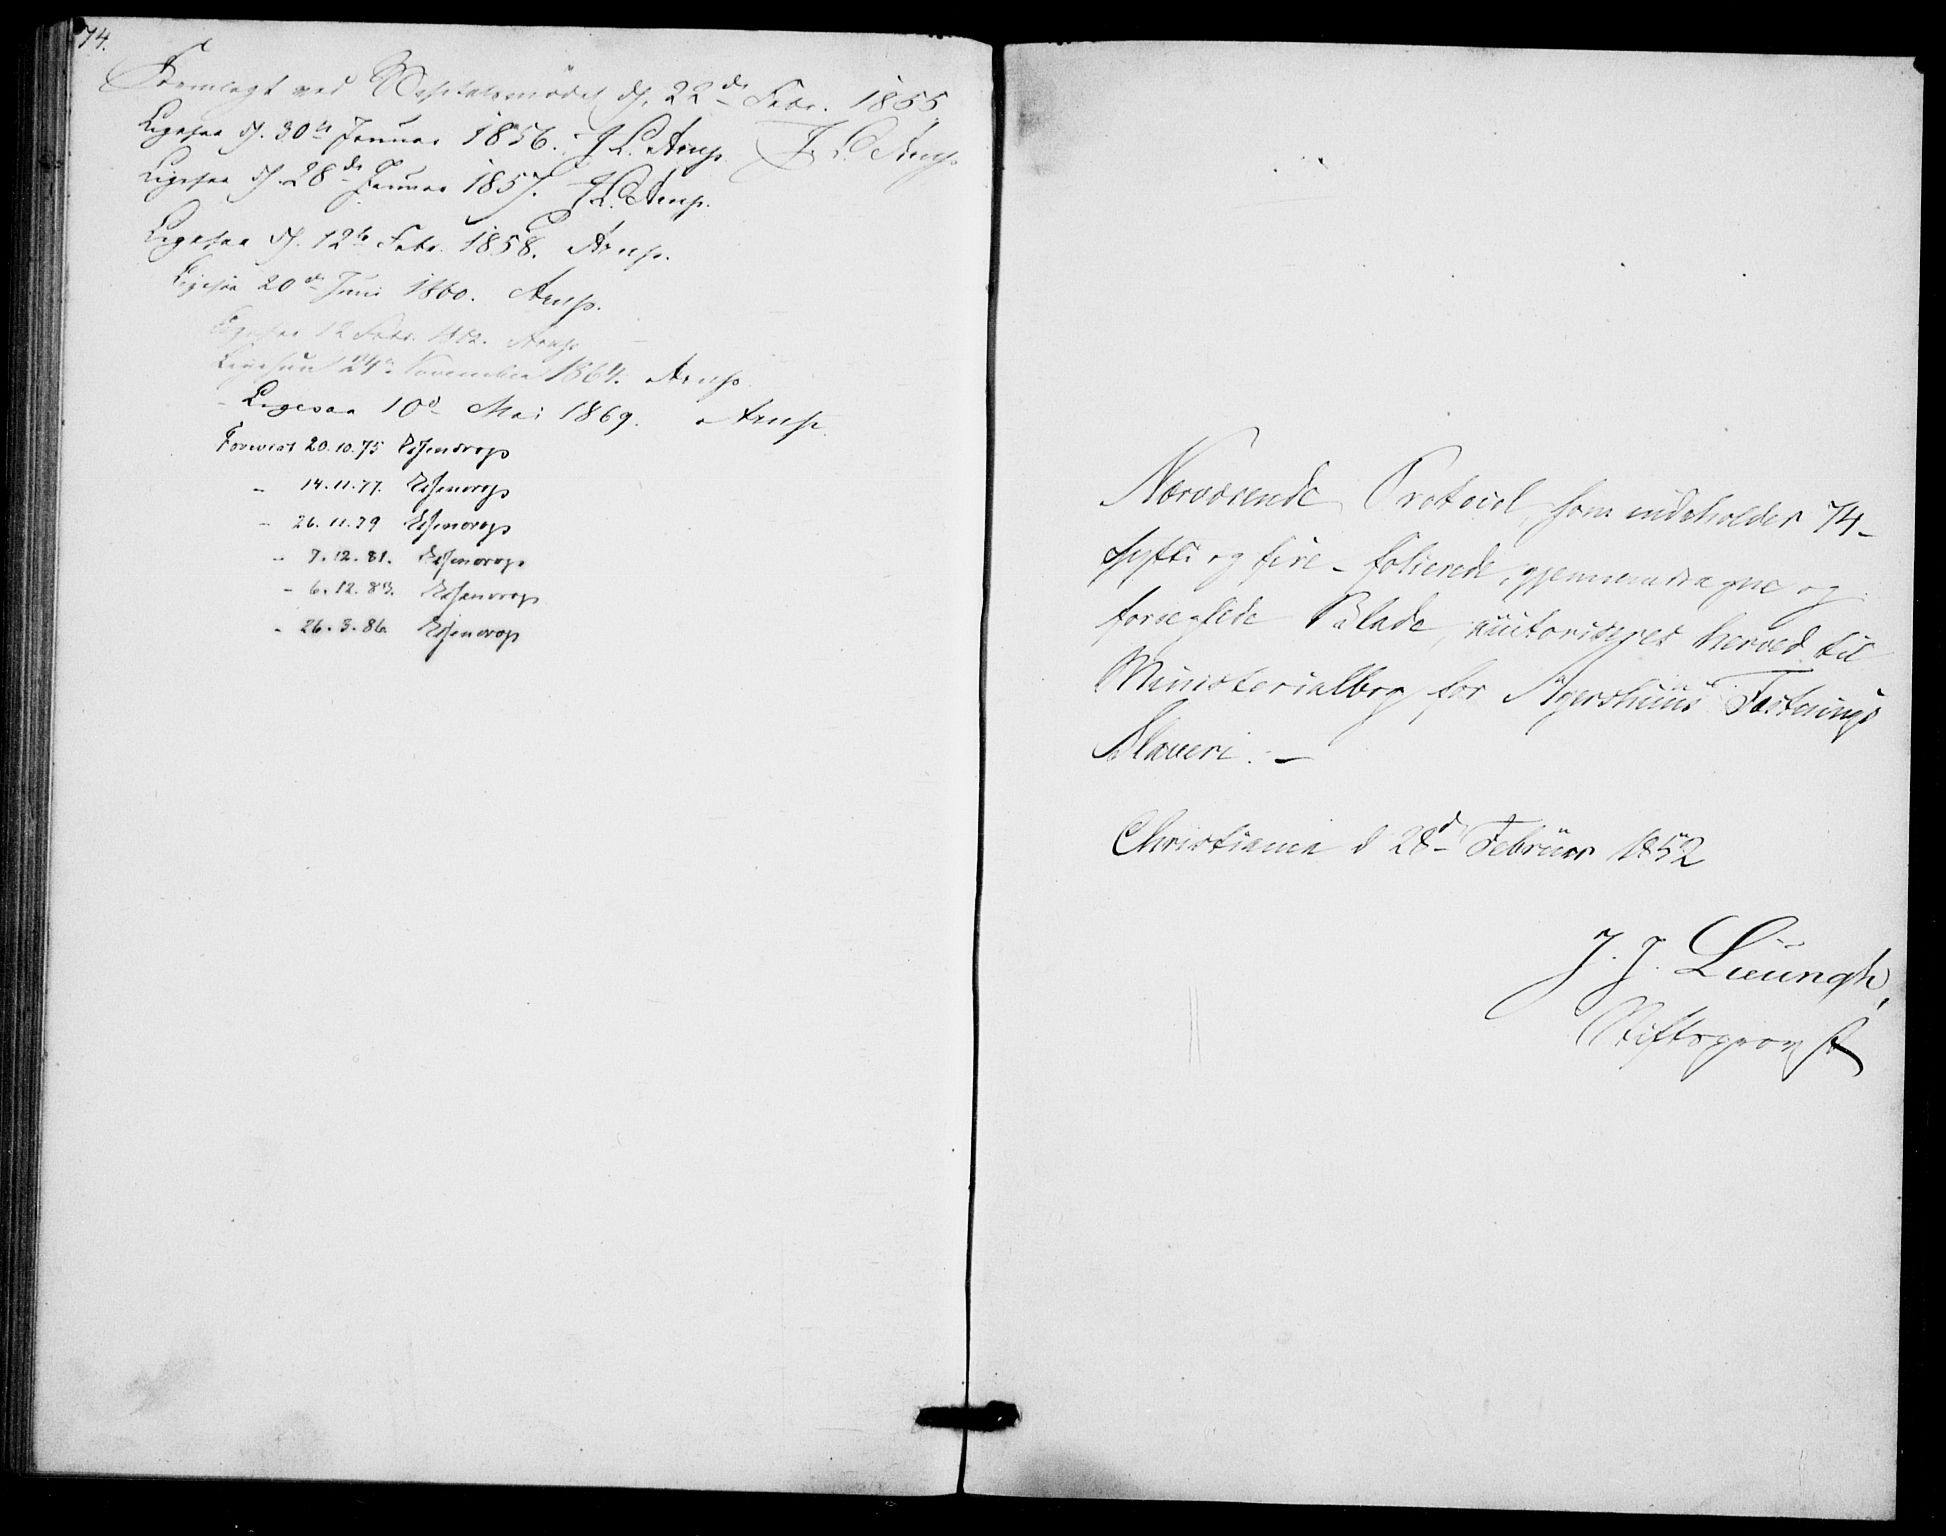 SAO, Akershus festnings slaveri Kirkebøker, F/Fa/L0002: Ministerialbok nr. 2, 1852-1883, s. 74